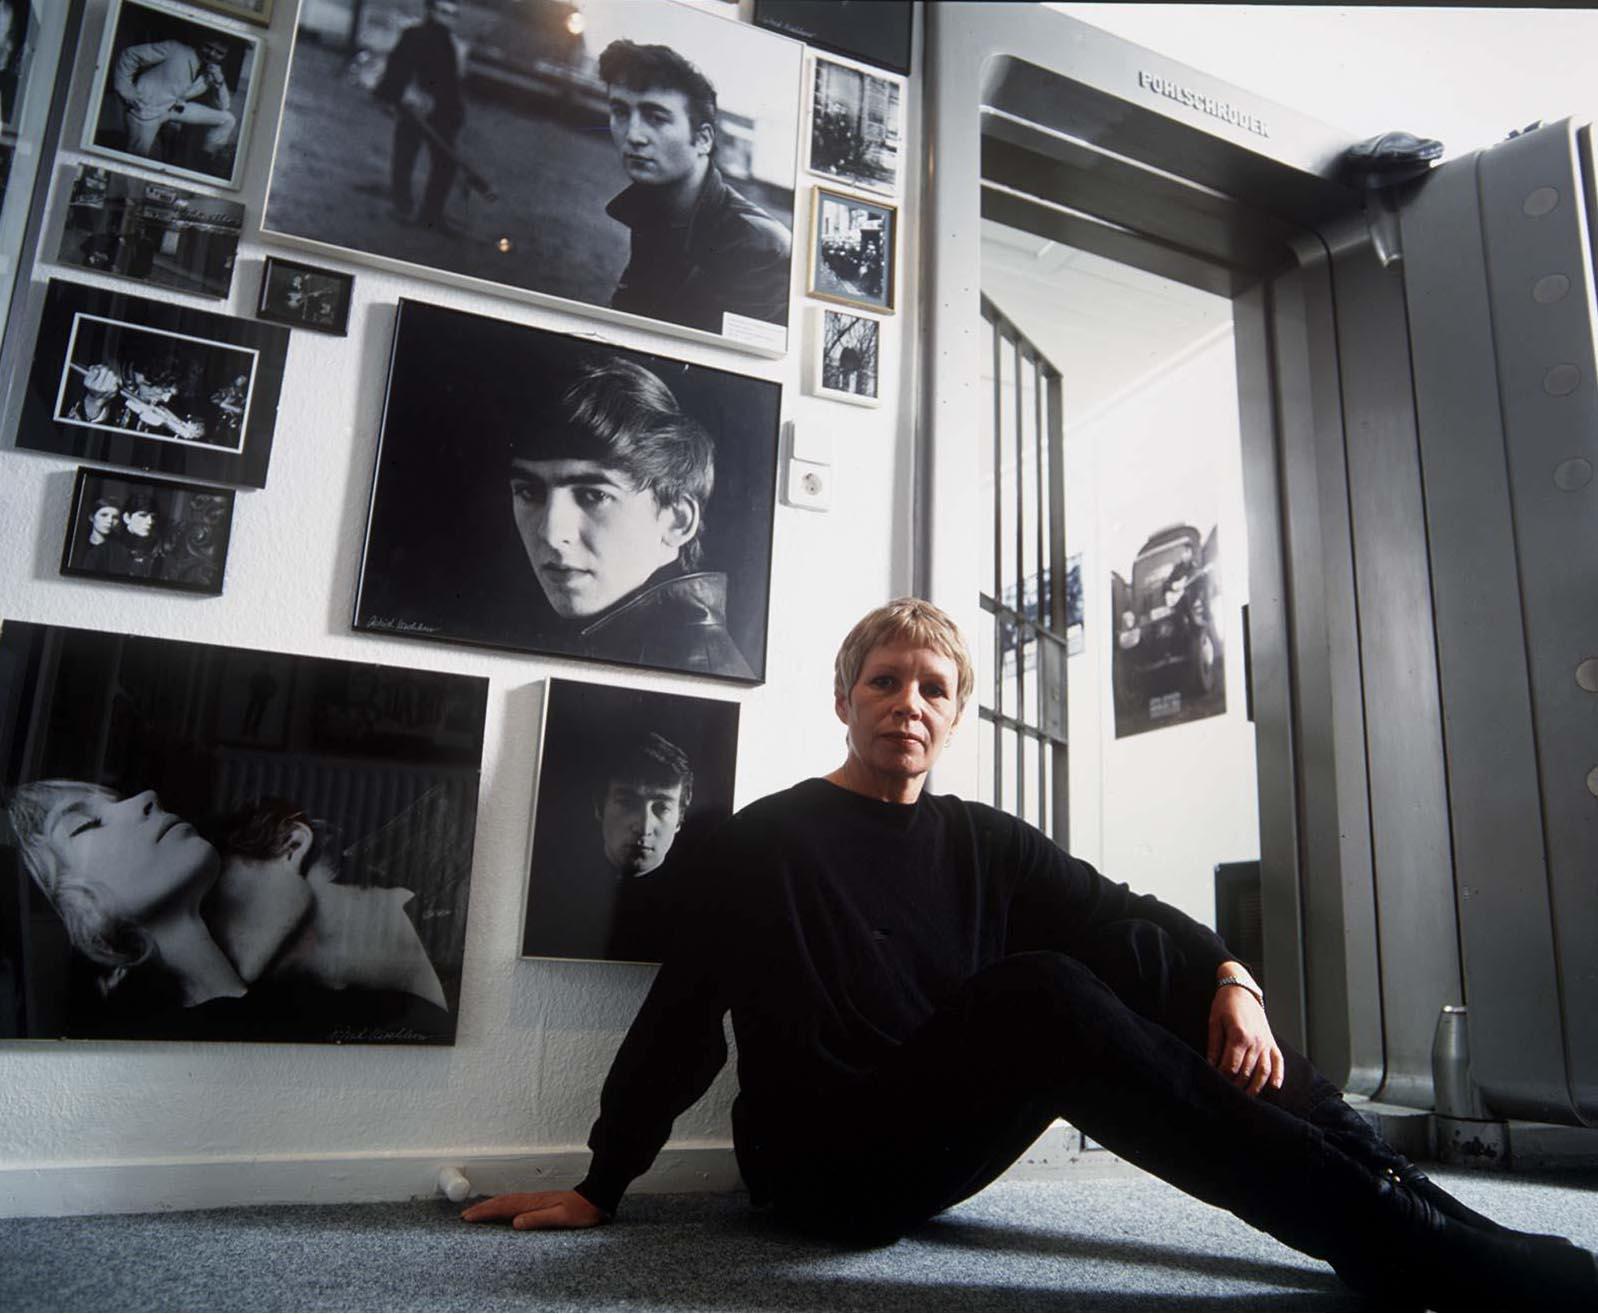 Mandatory Credit: Photo by Geoff Wilkinson/Shutterstock (245379b) ASTRID KIRCHHERR ASTRID KIRCHHERR - 1995